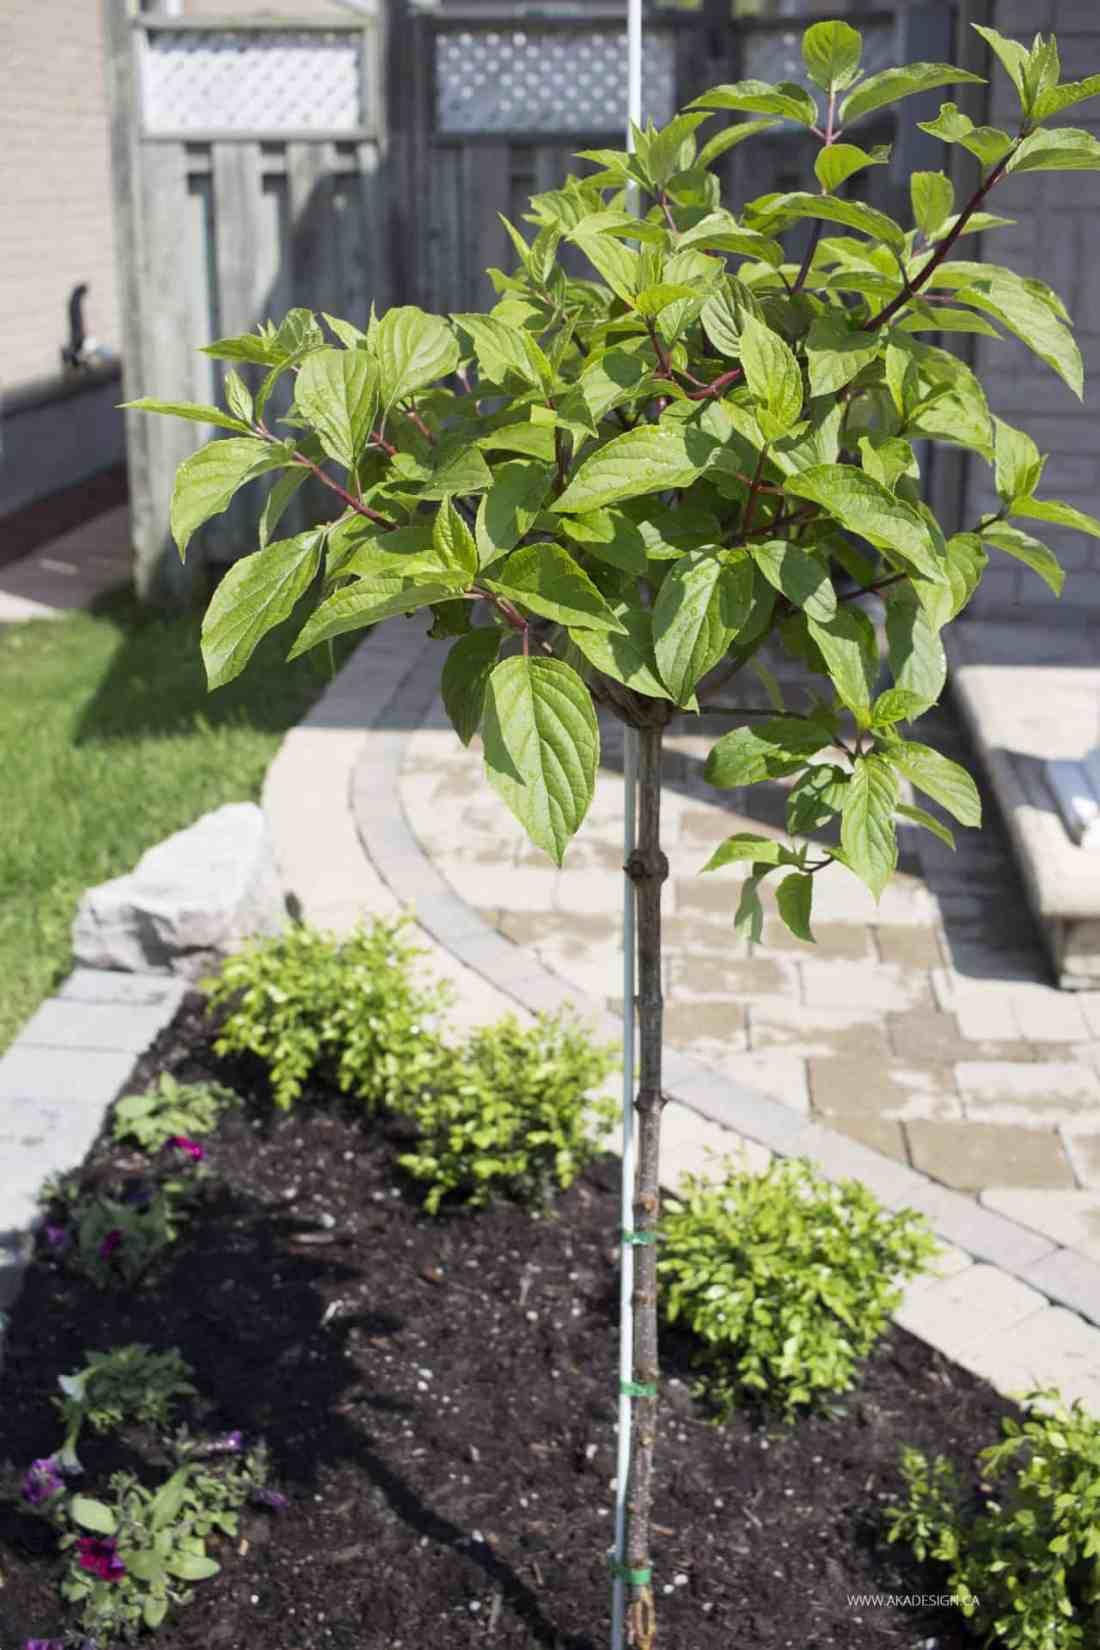 hydrangea standard tree new no flowers yet